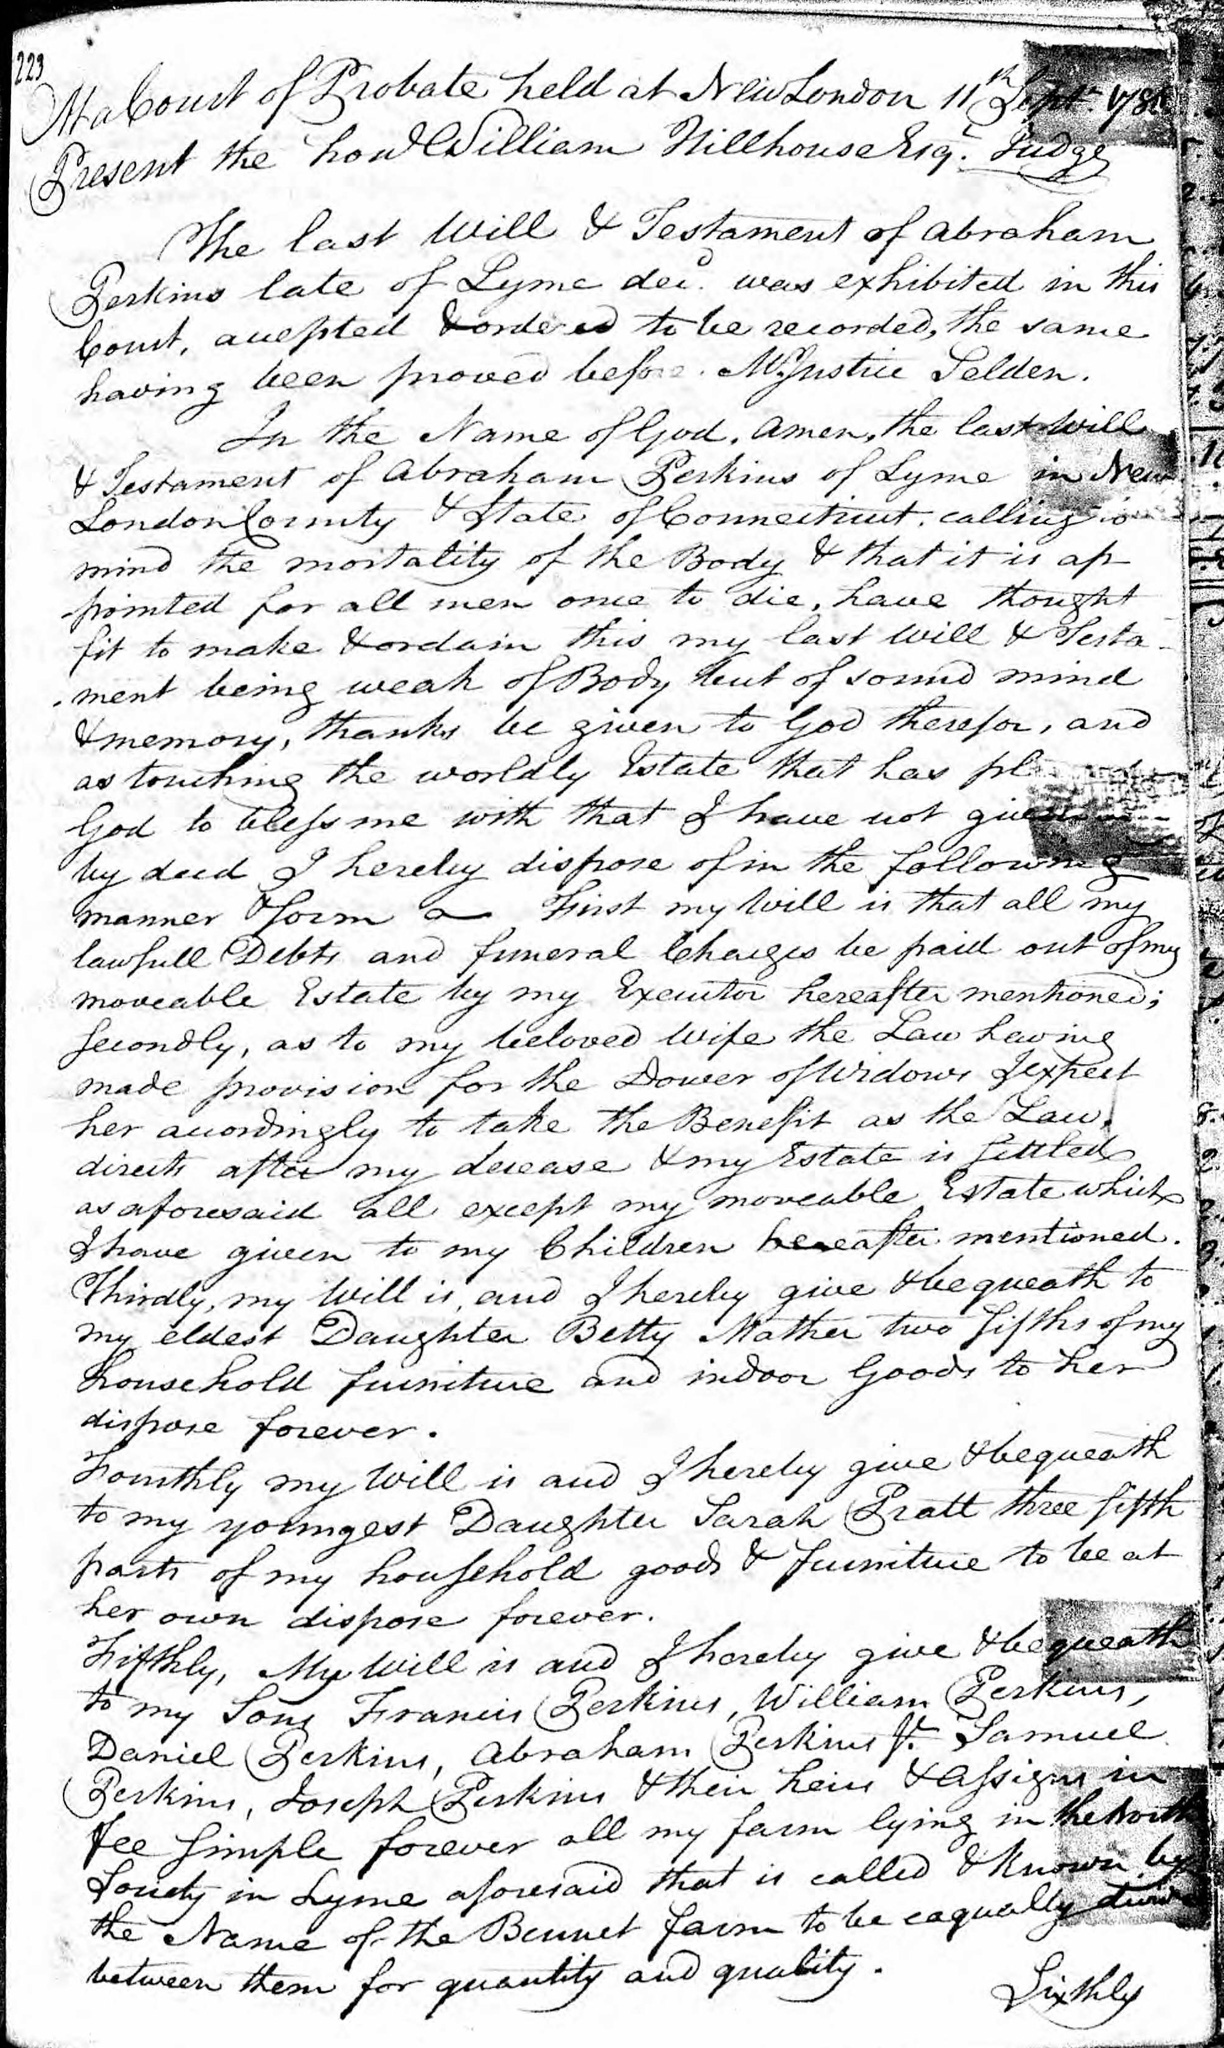 1786 Will of Abraham Perkins